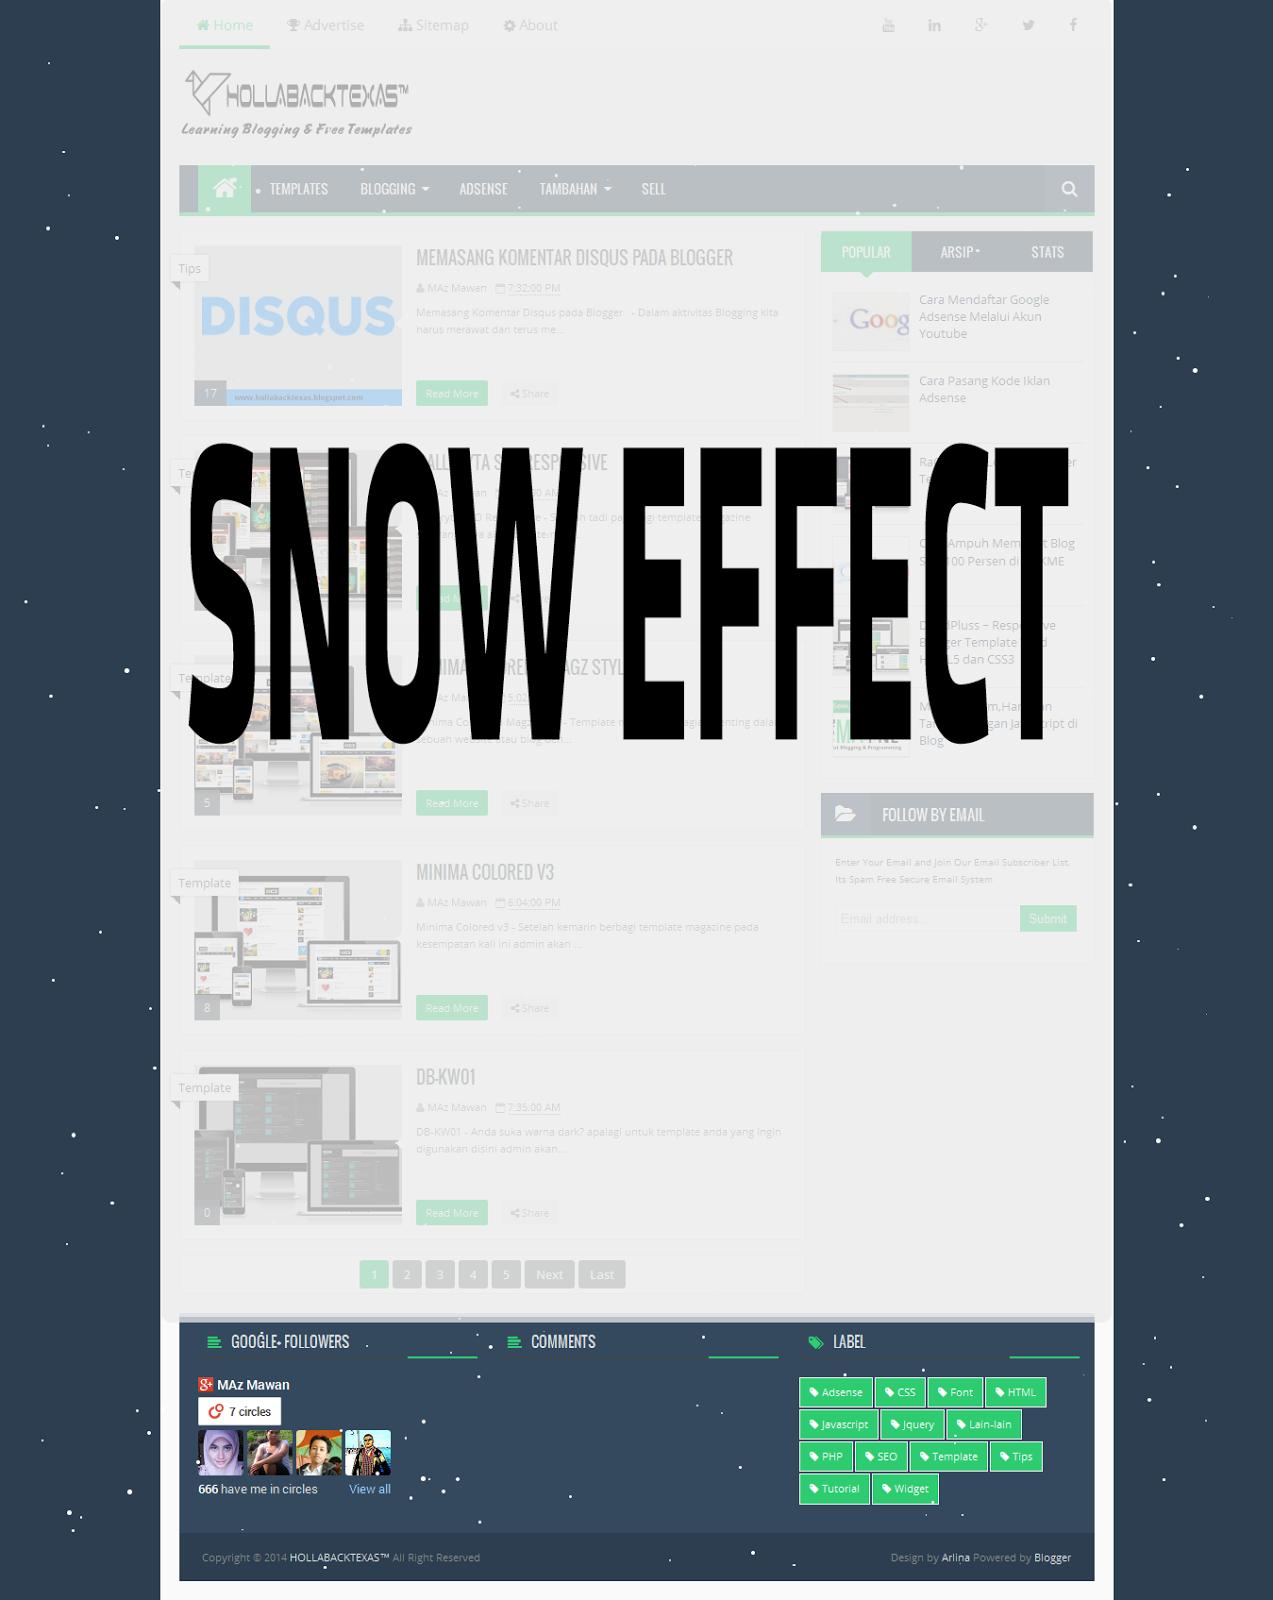 snoweffect